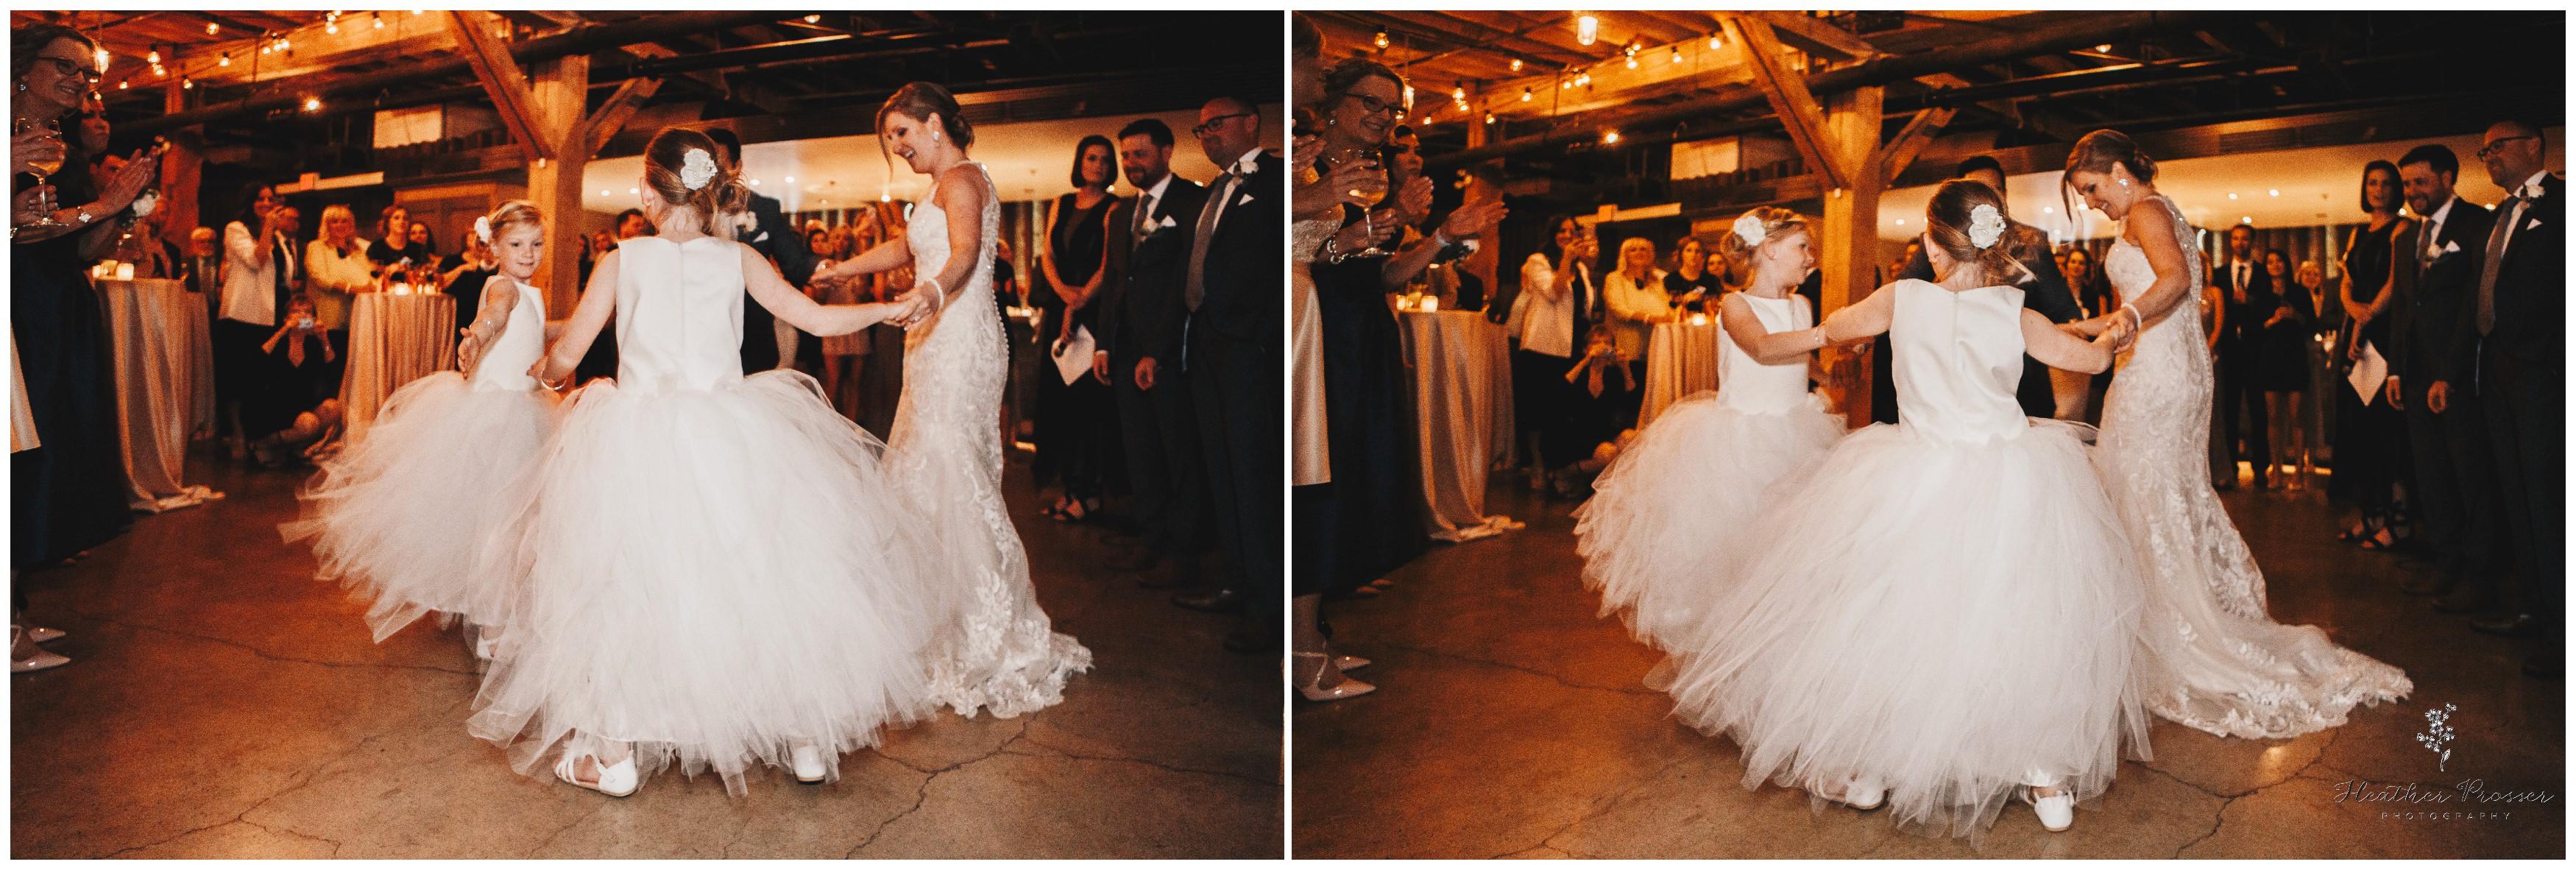 Toronto Distillery District Wedding_2598.jpg